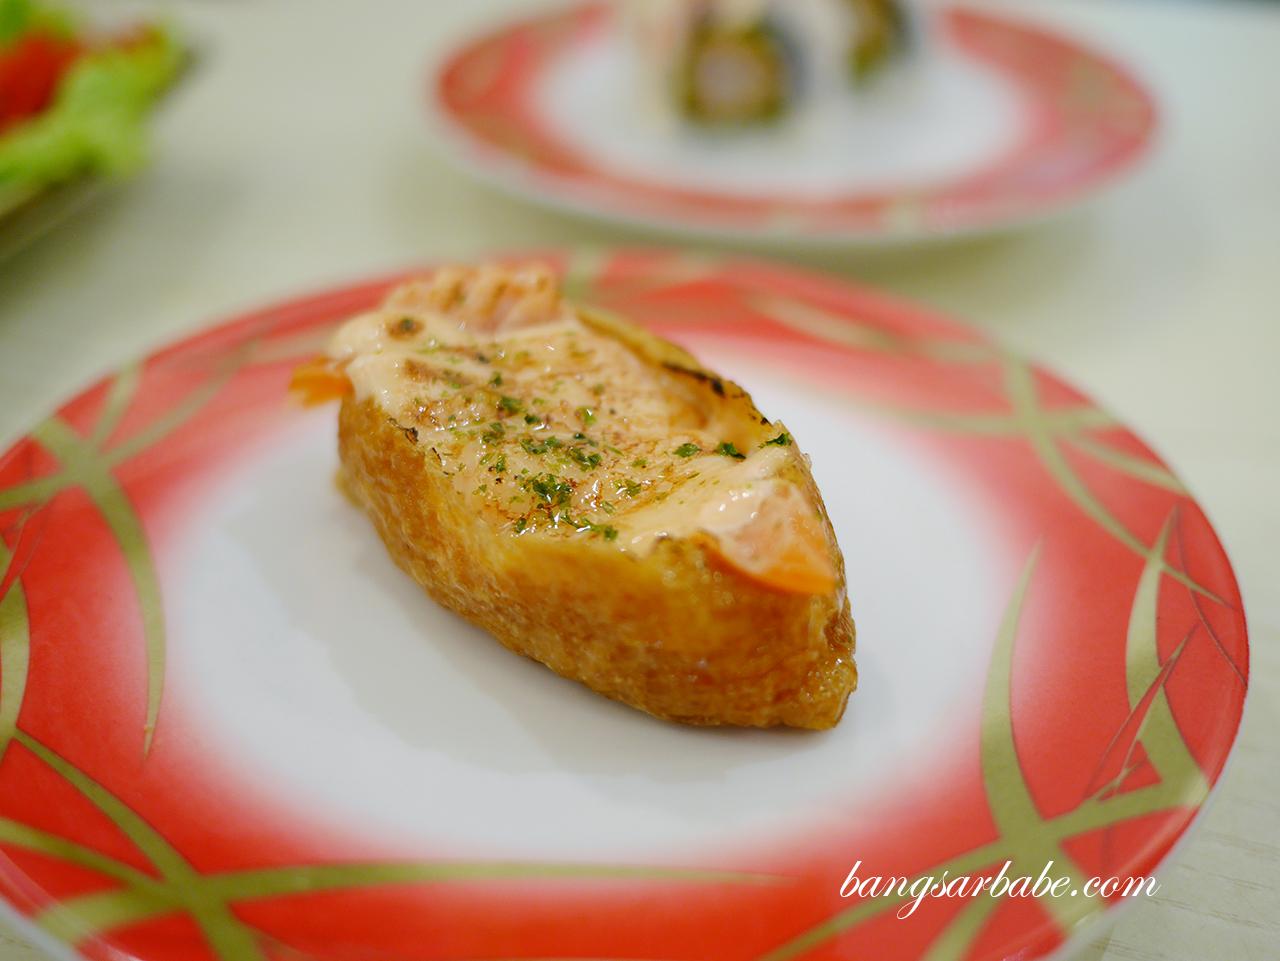 Inari Salmon Mentai